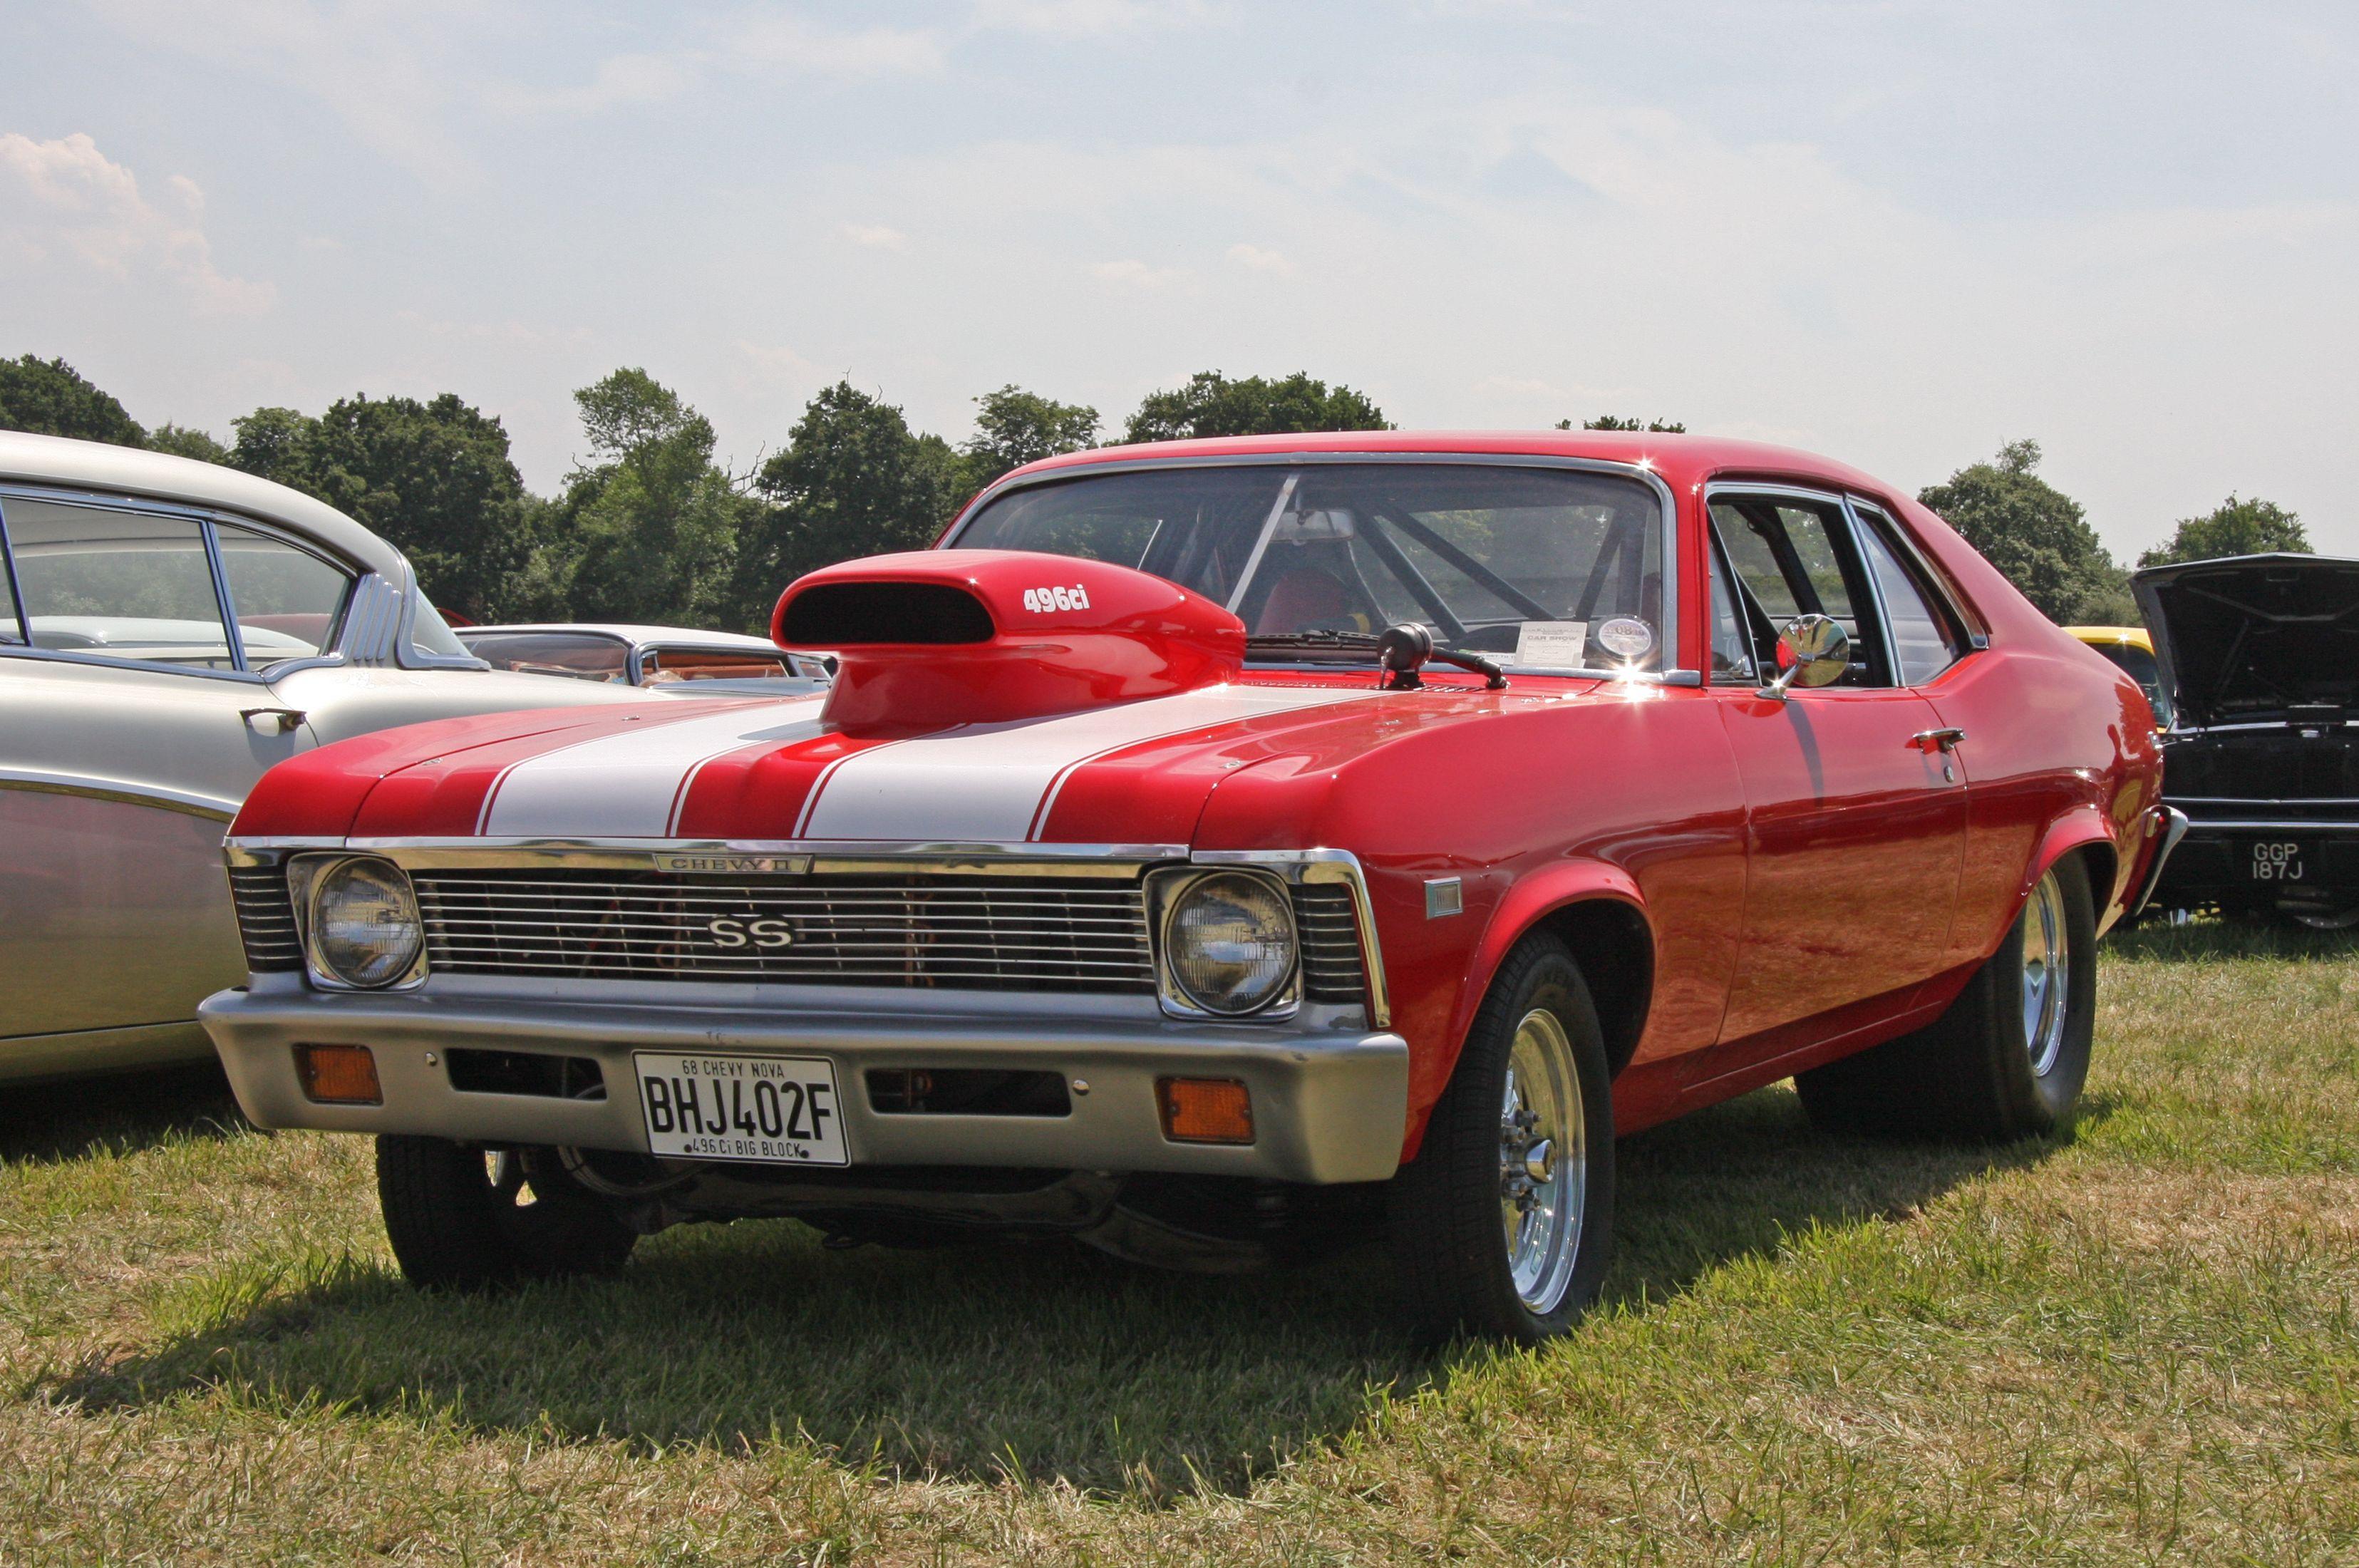 File:1968 Chevy Nova SS - Flickr - exfordy.jpg - Wikimedia Commons ...